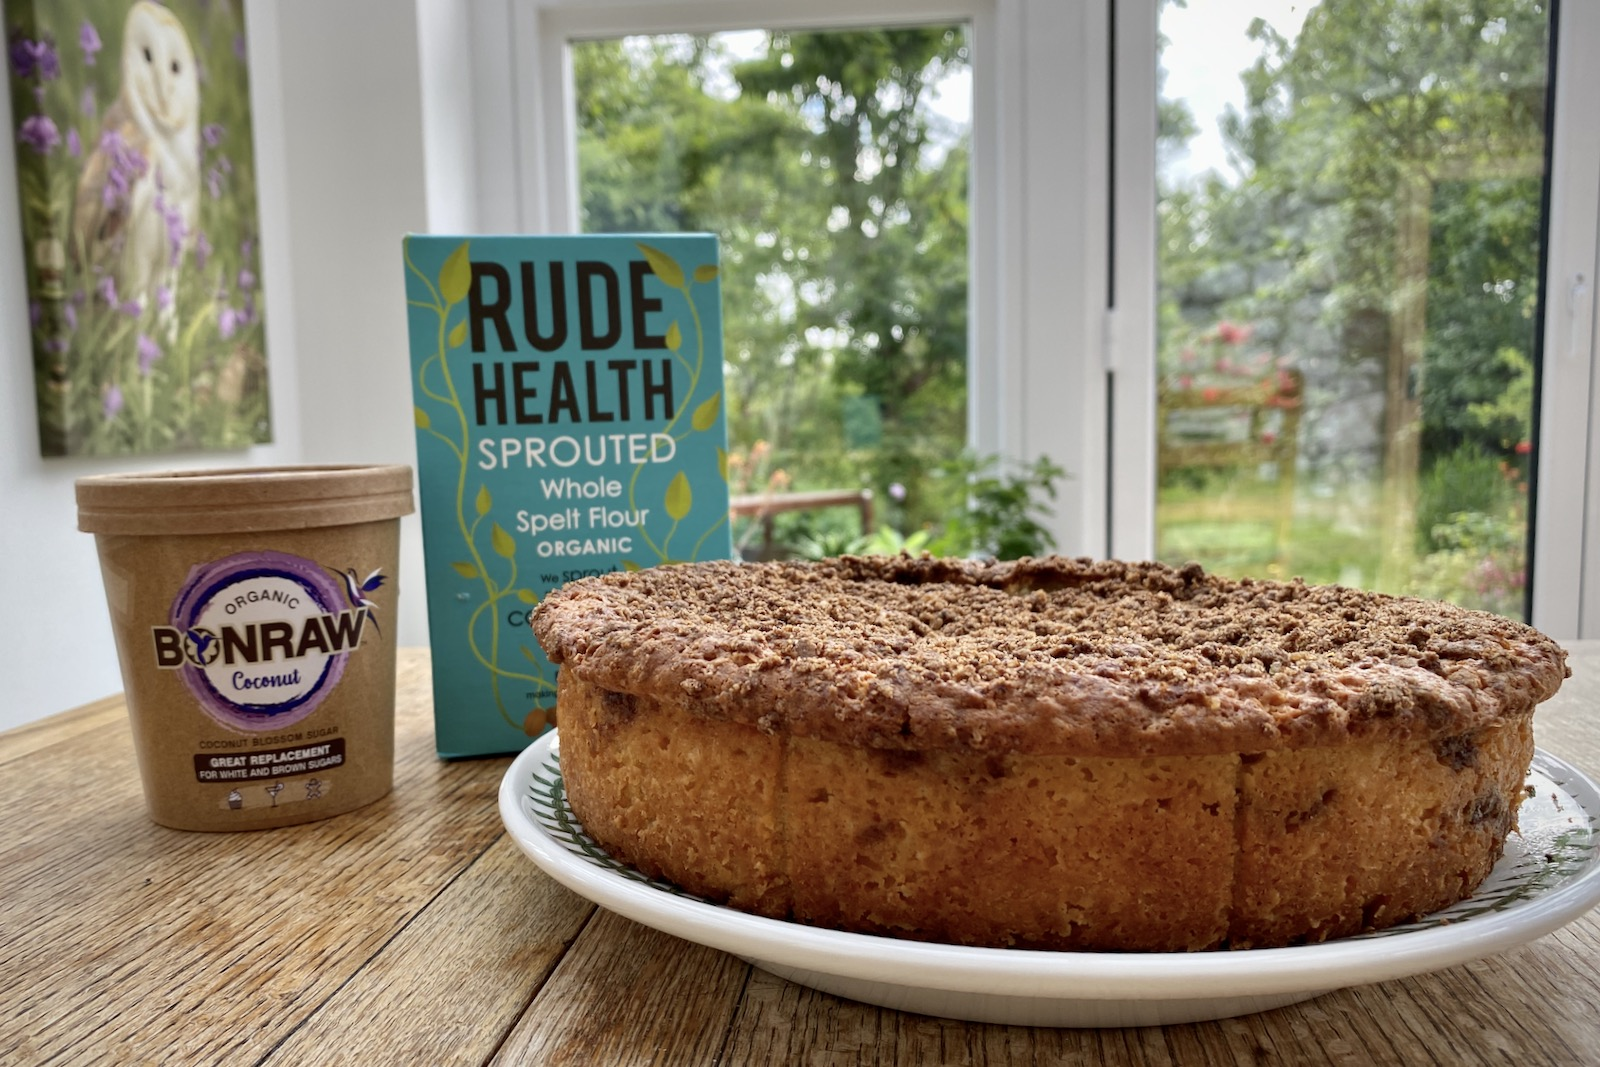 Bonraw Rude Health Apple and Cinnamon Streusel Cake